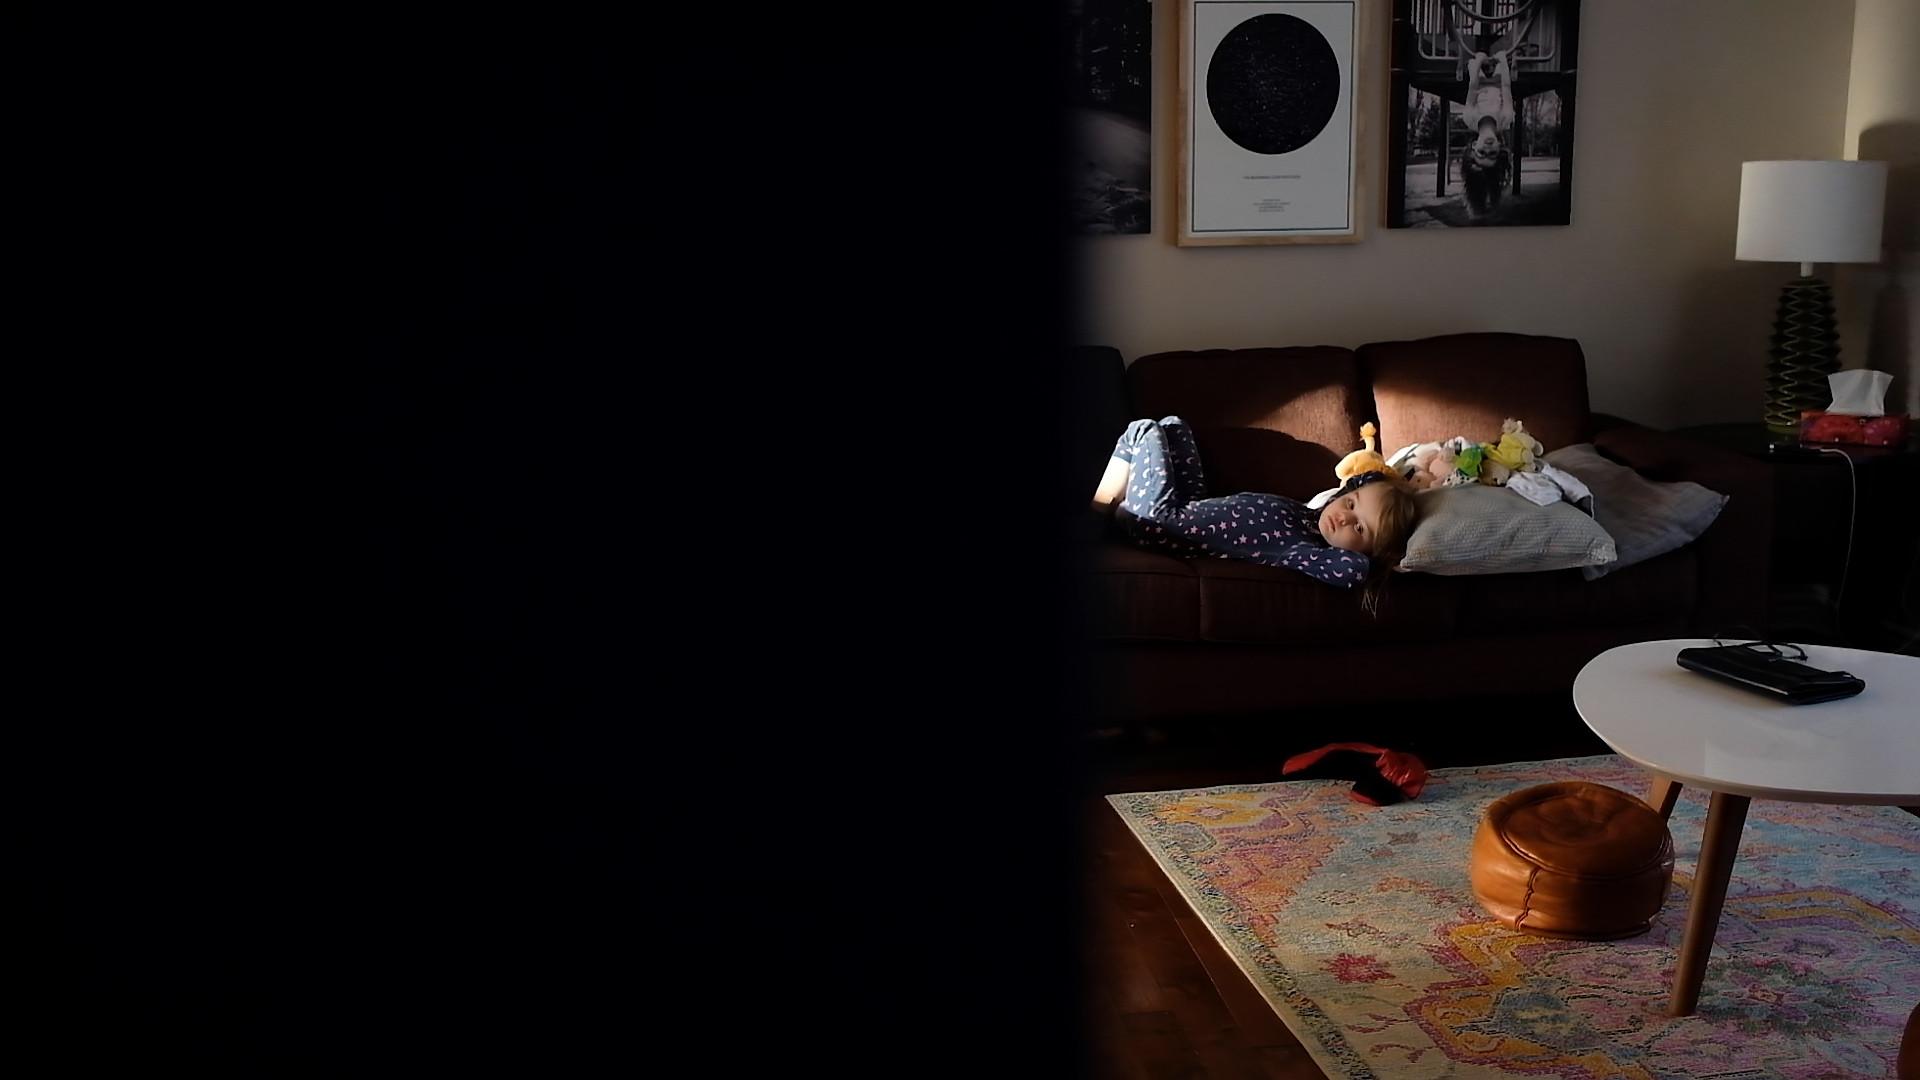 Ottawa Gatineau family documentary photographer and videographer